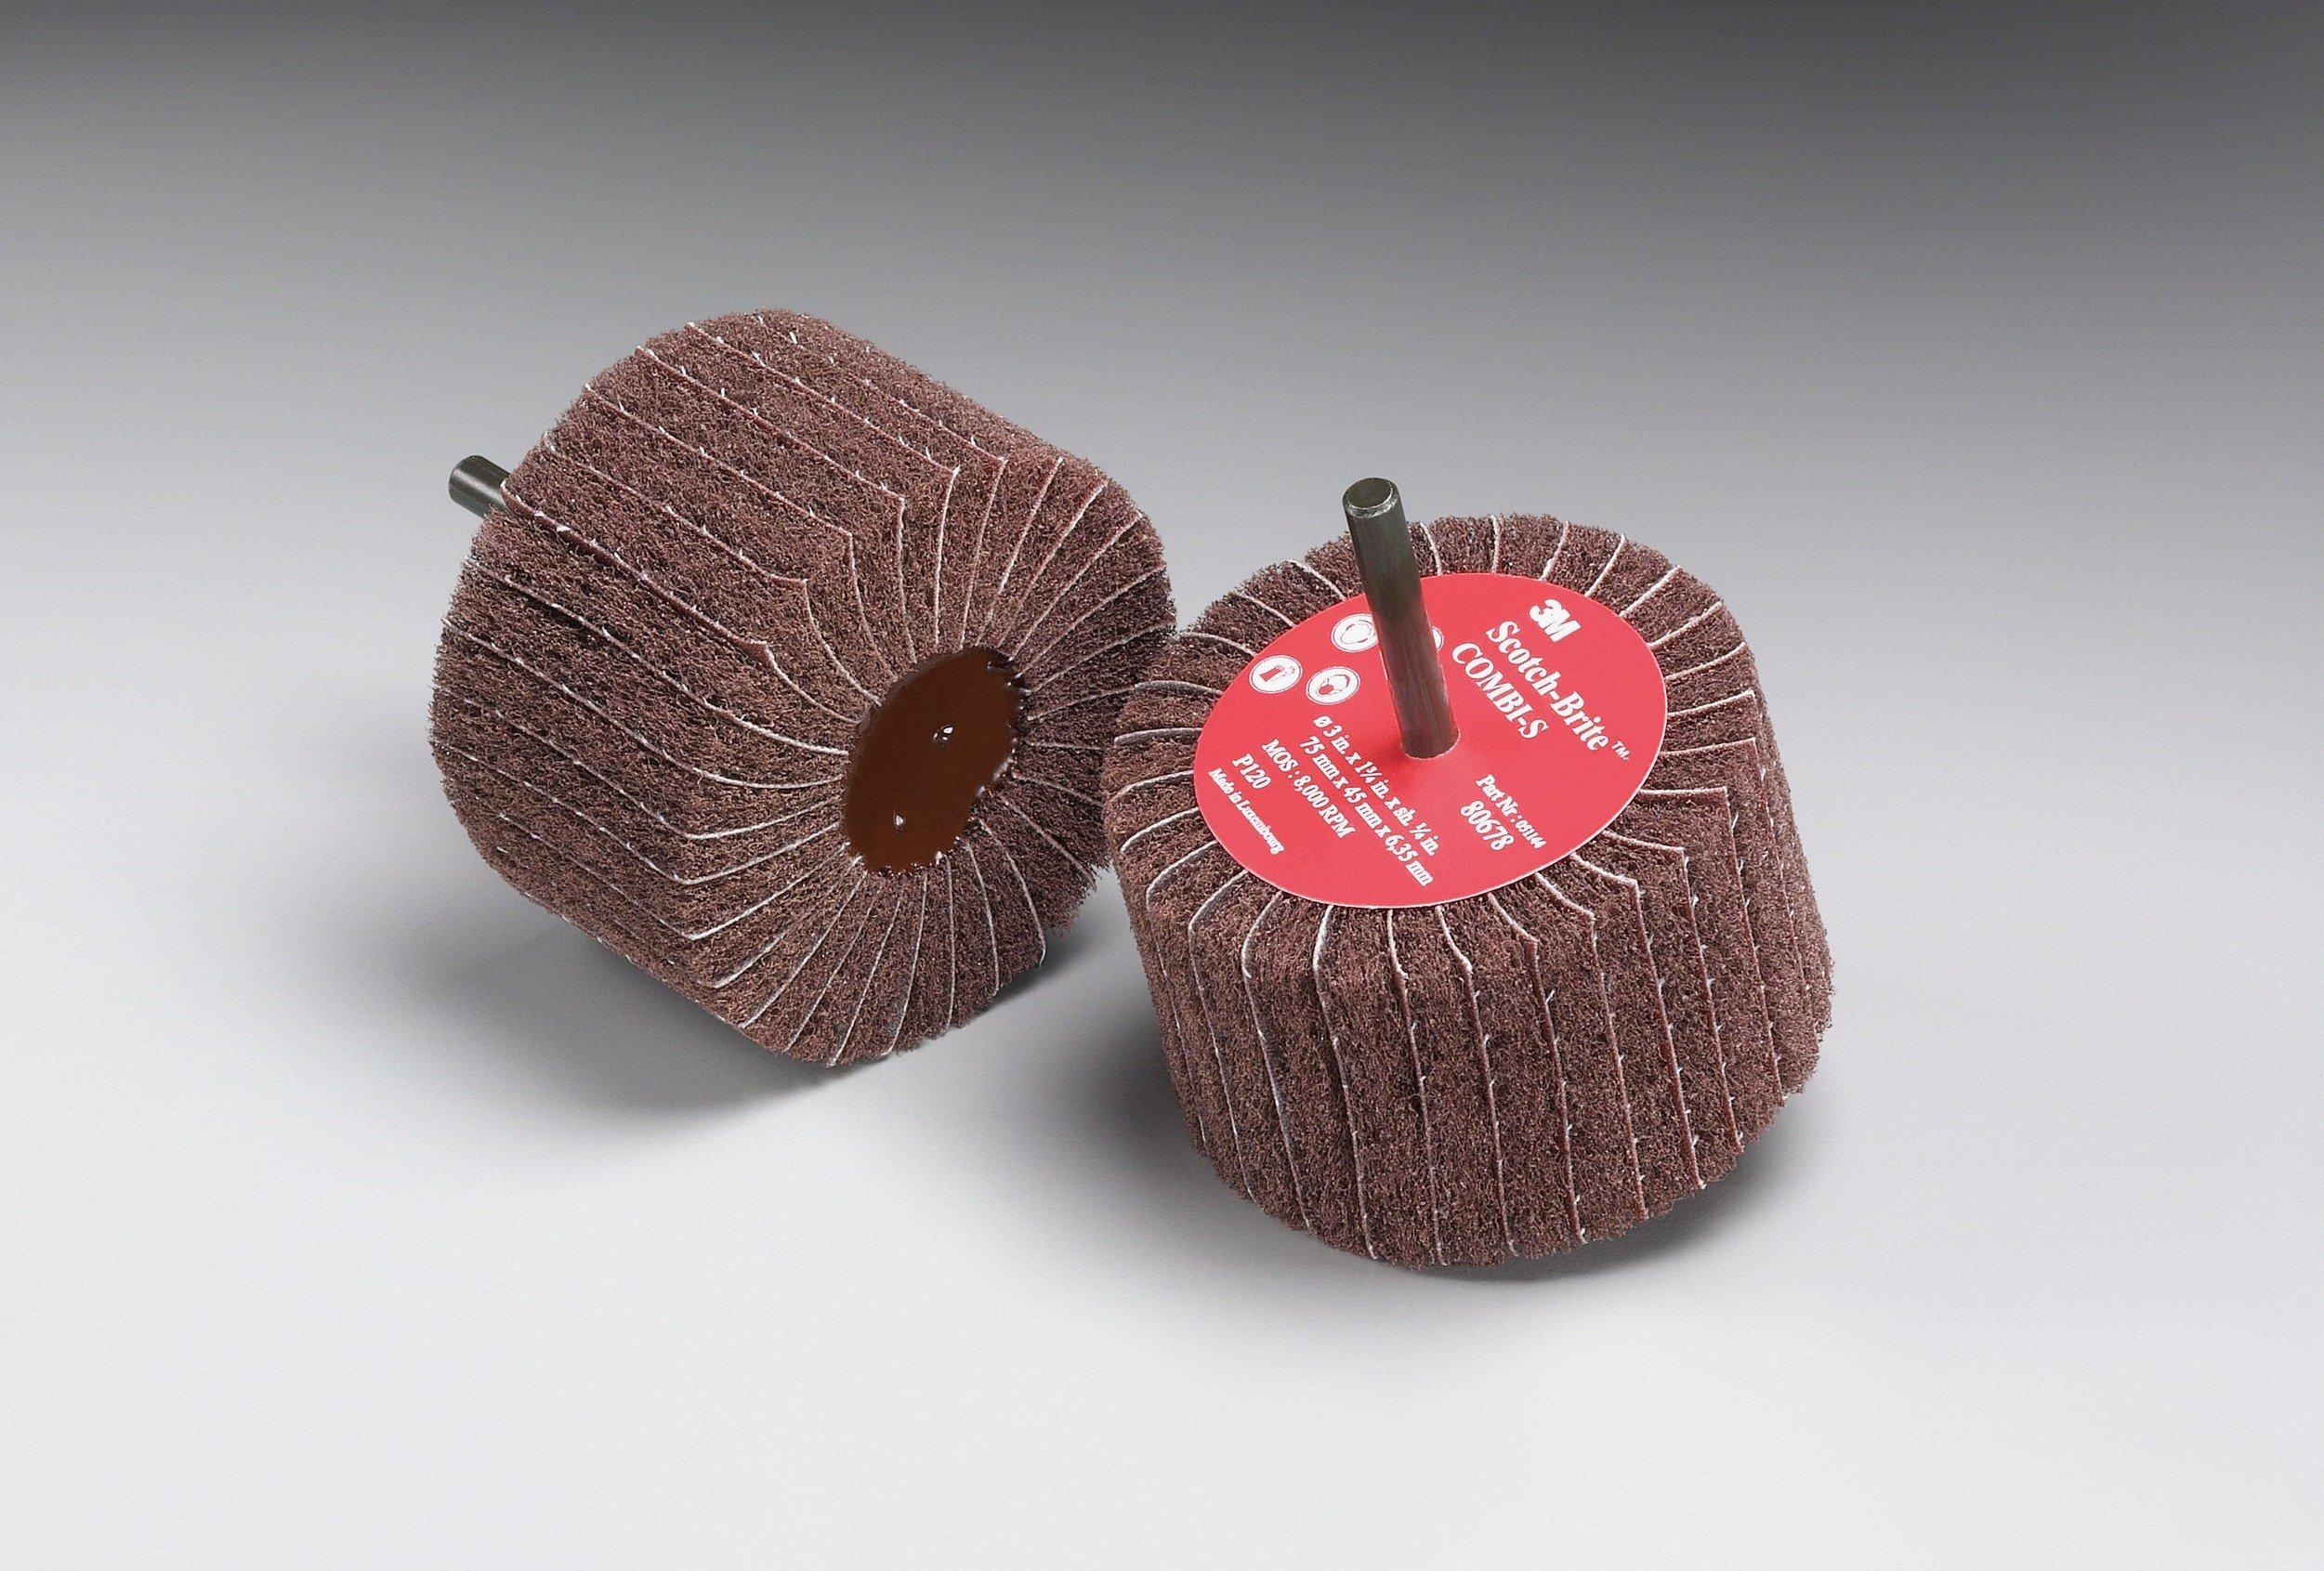 Scotch-Brite(TM) Combi-S Wheel 80799, X-Weight, Aluminum Oxide, 3'' Diameter x 1-3/4'' Width, 1/4'' Shank, P180 Grit, 8000 rpm, Maroon  (Pack of 10)